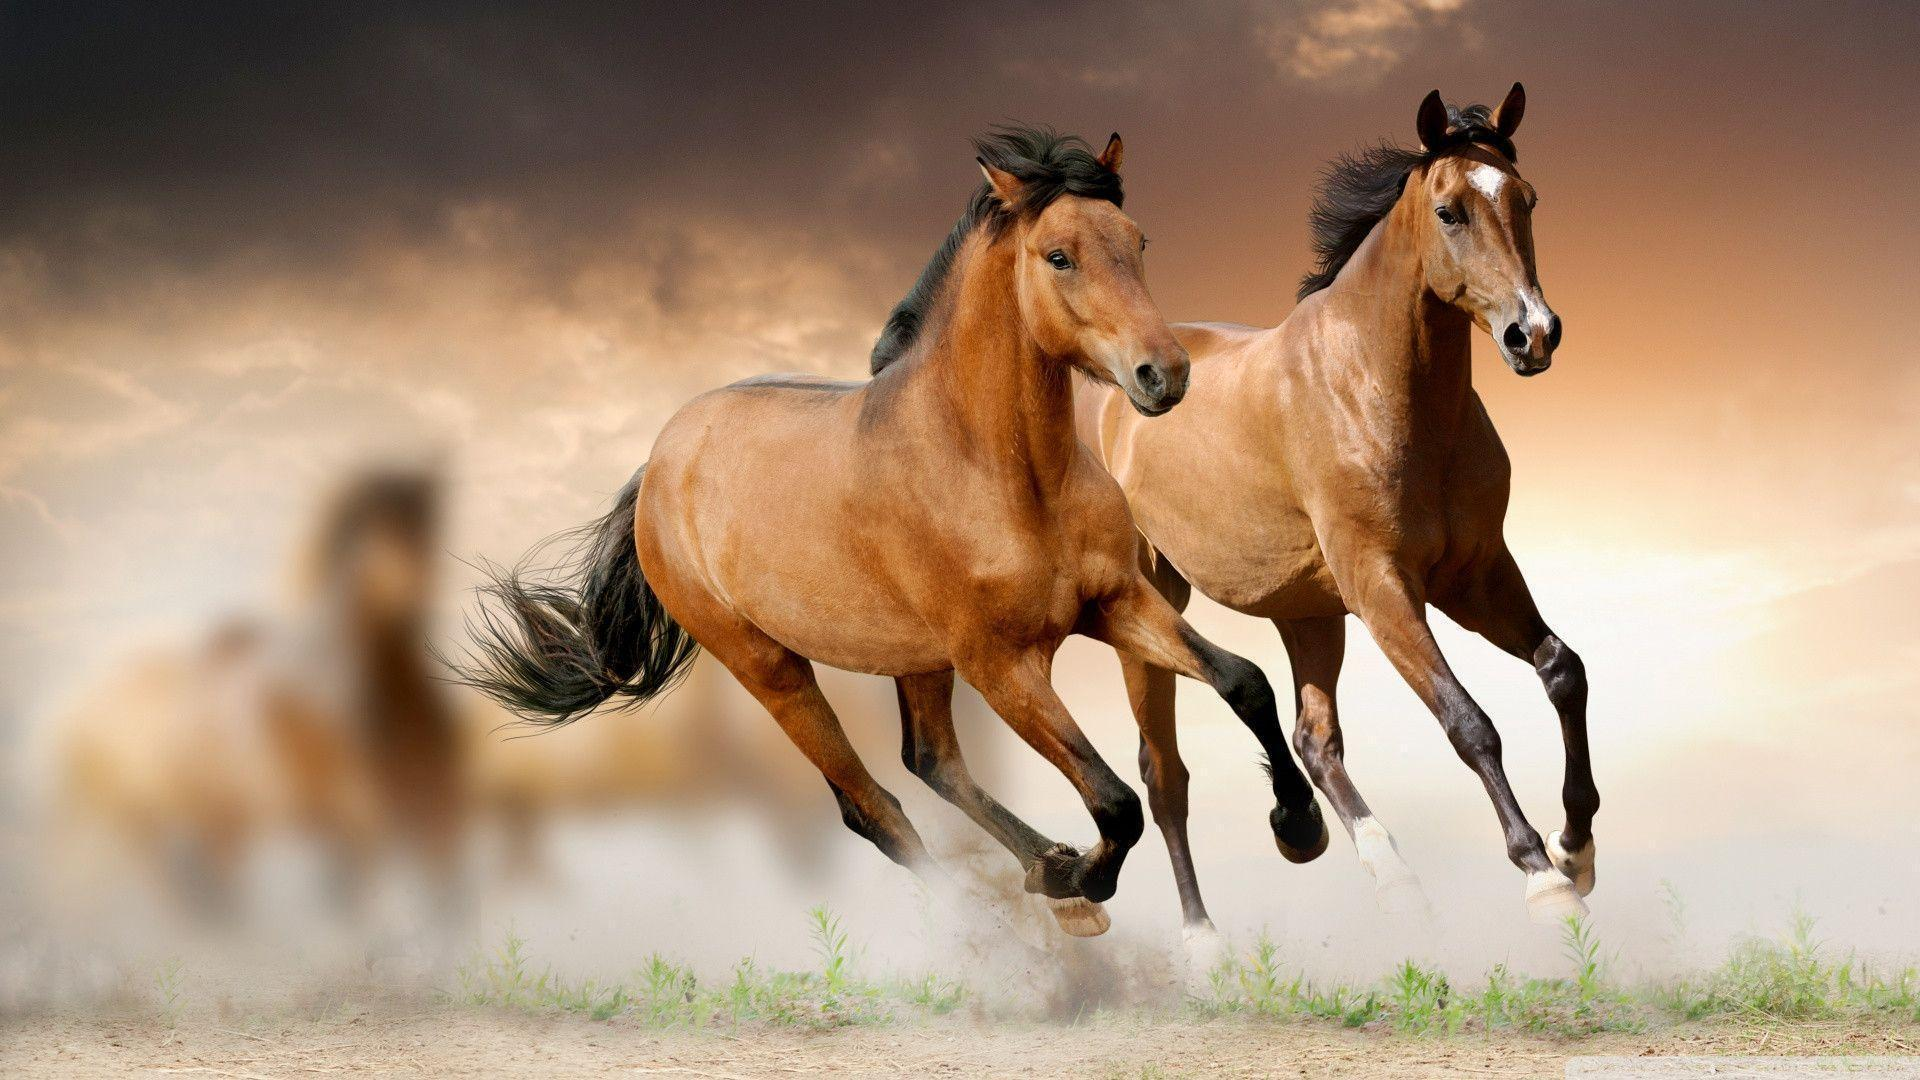 Horses Wallpapers Free Wallpaper Cave